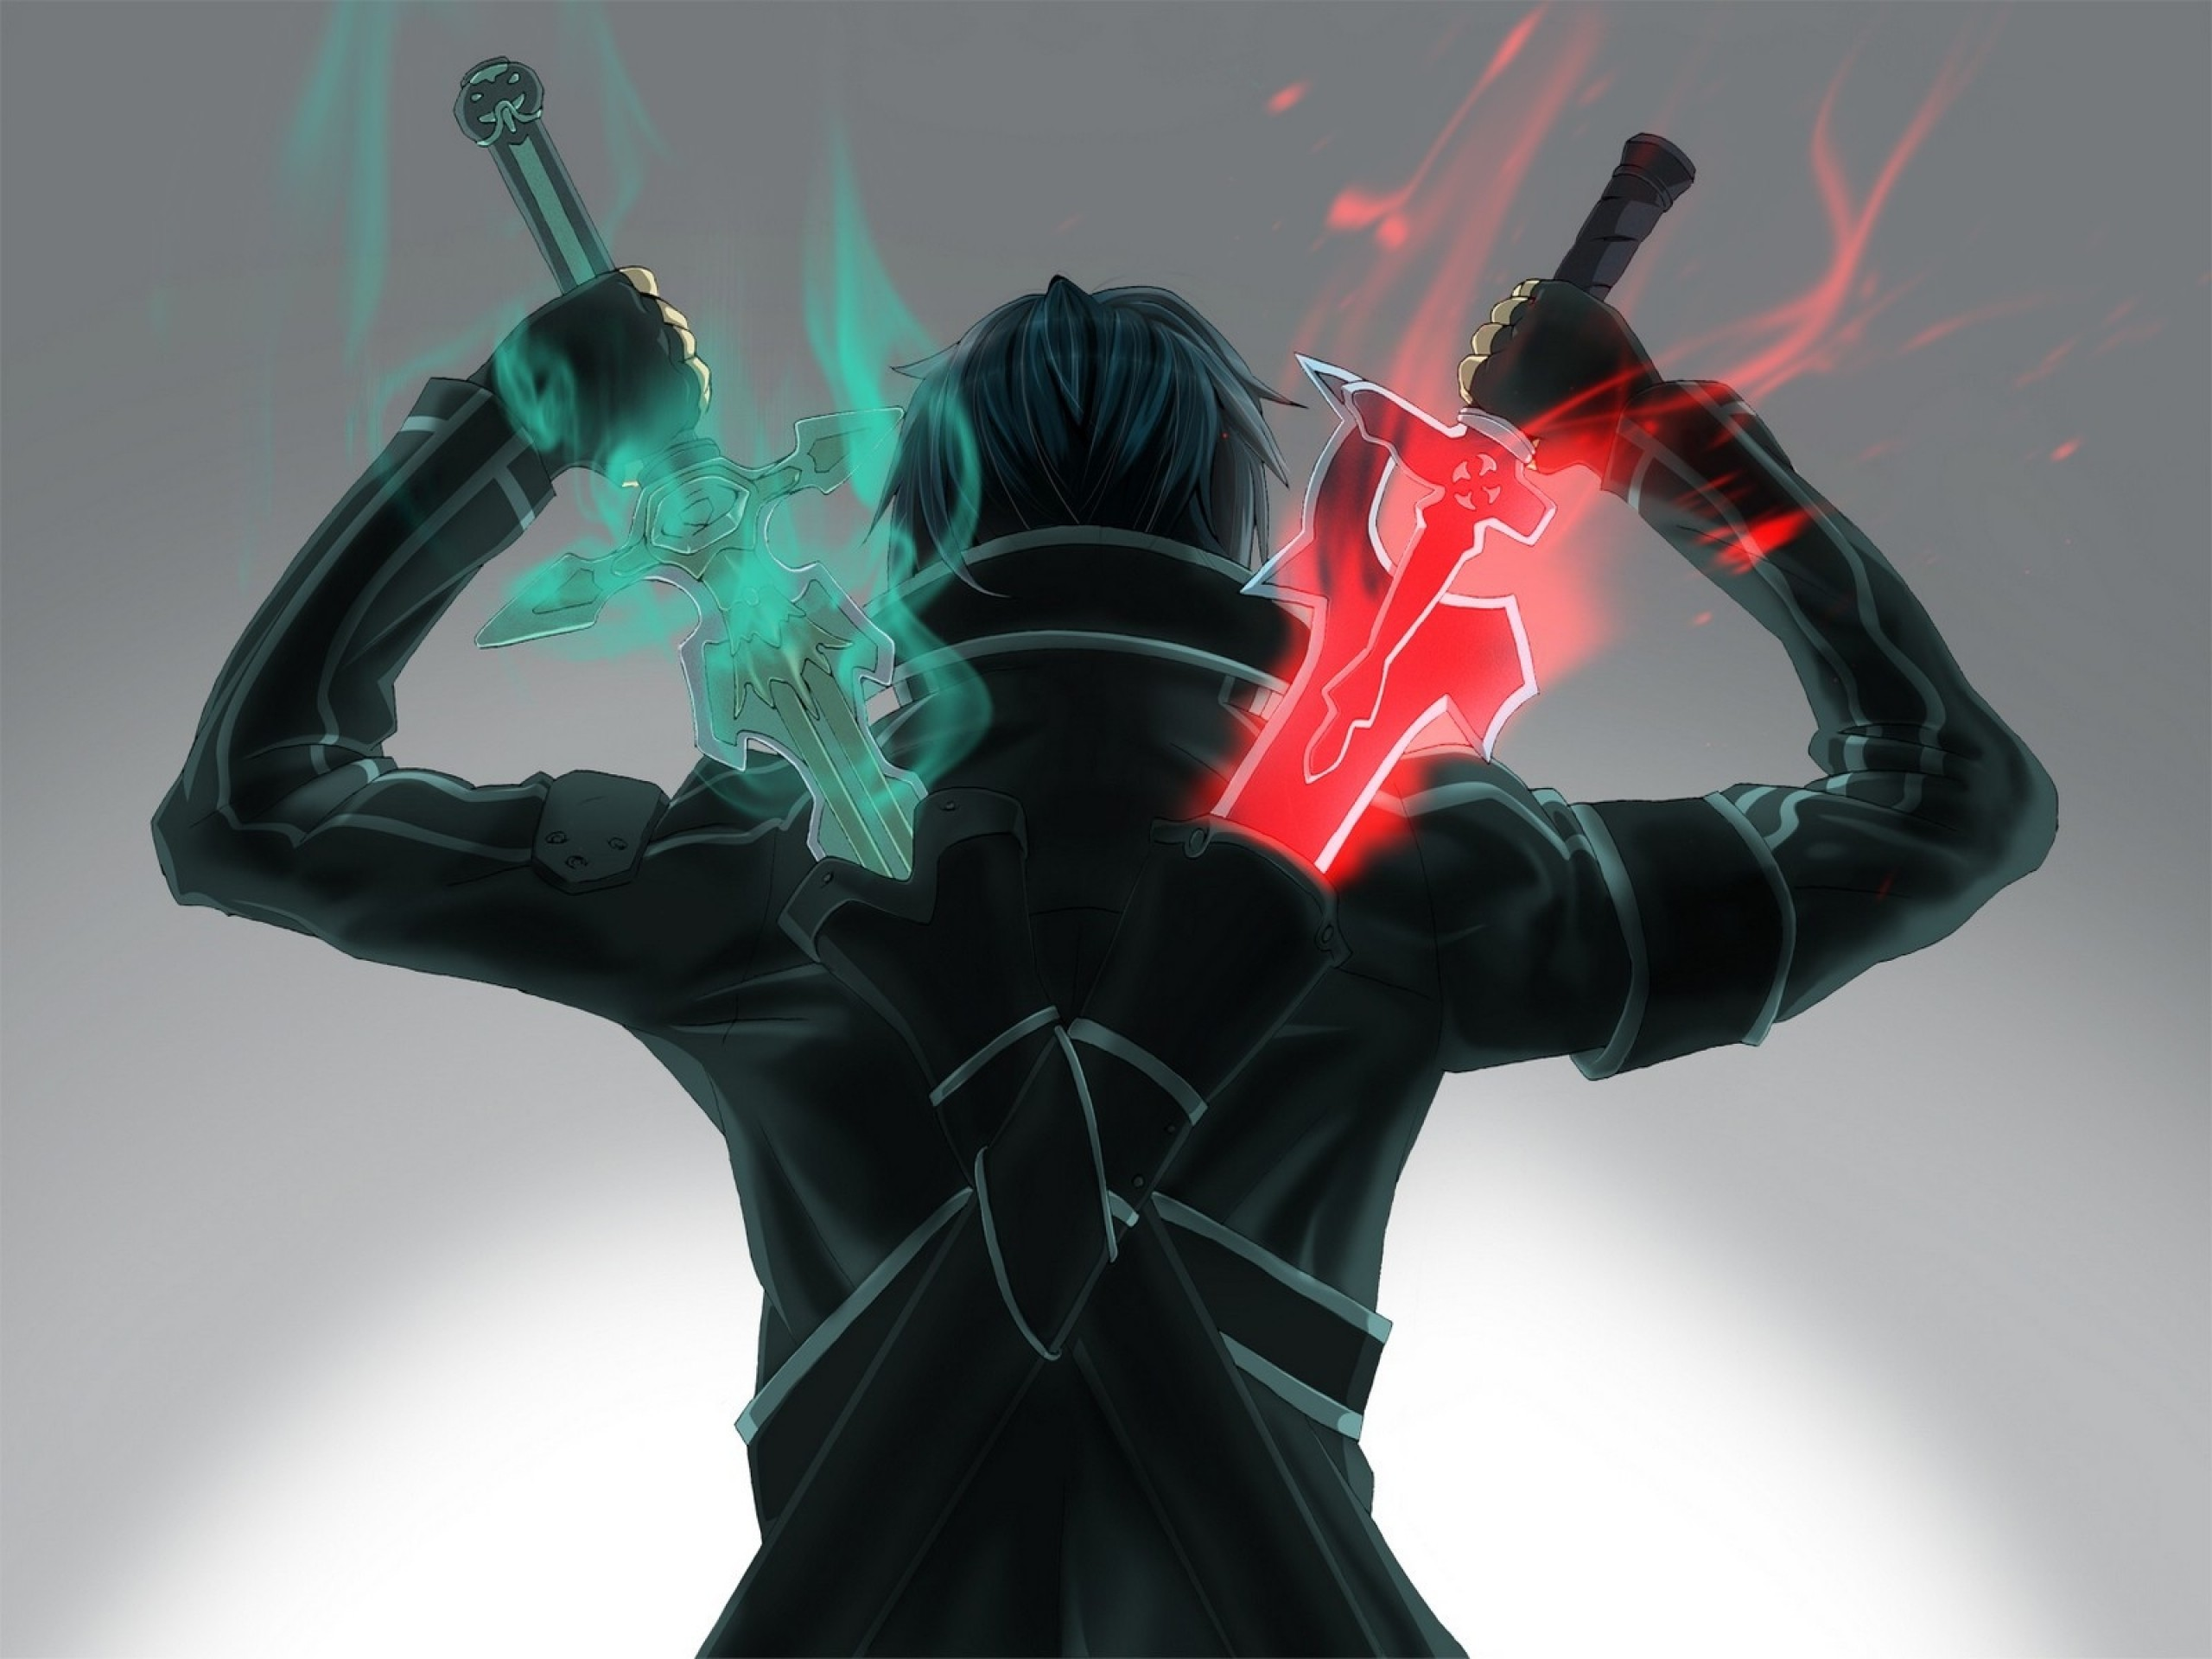 Fondos de pantalla Anime Kirito Sword Art Online